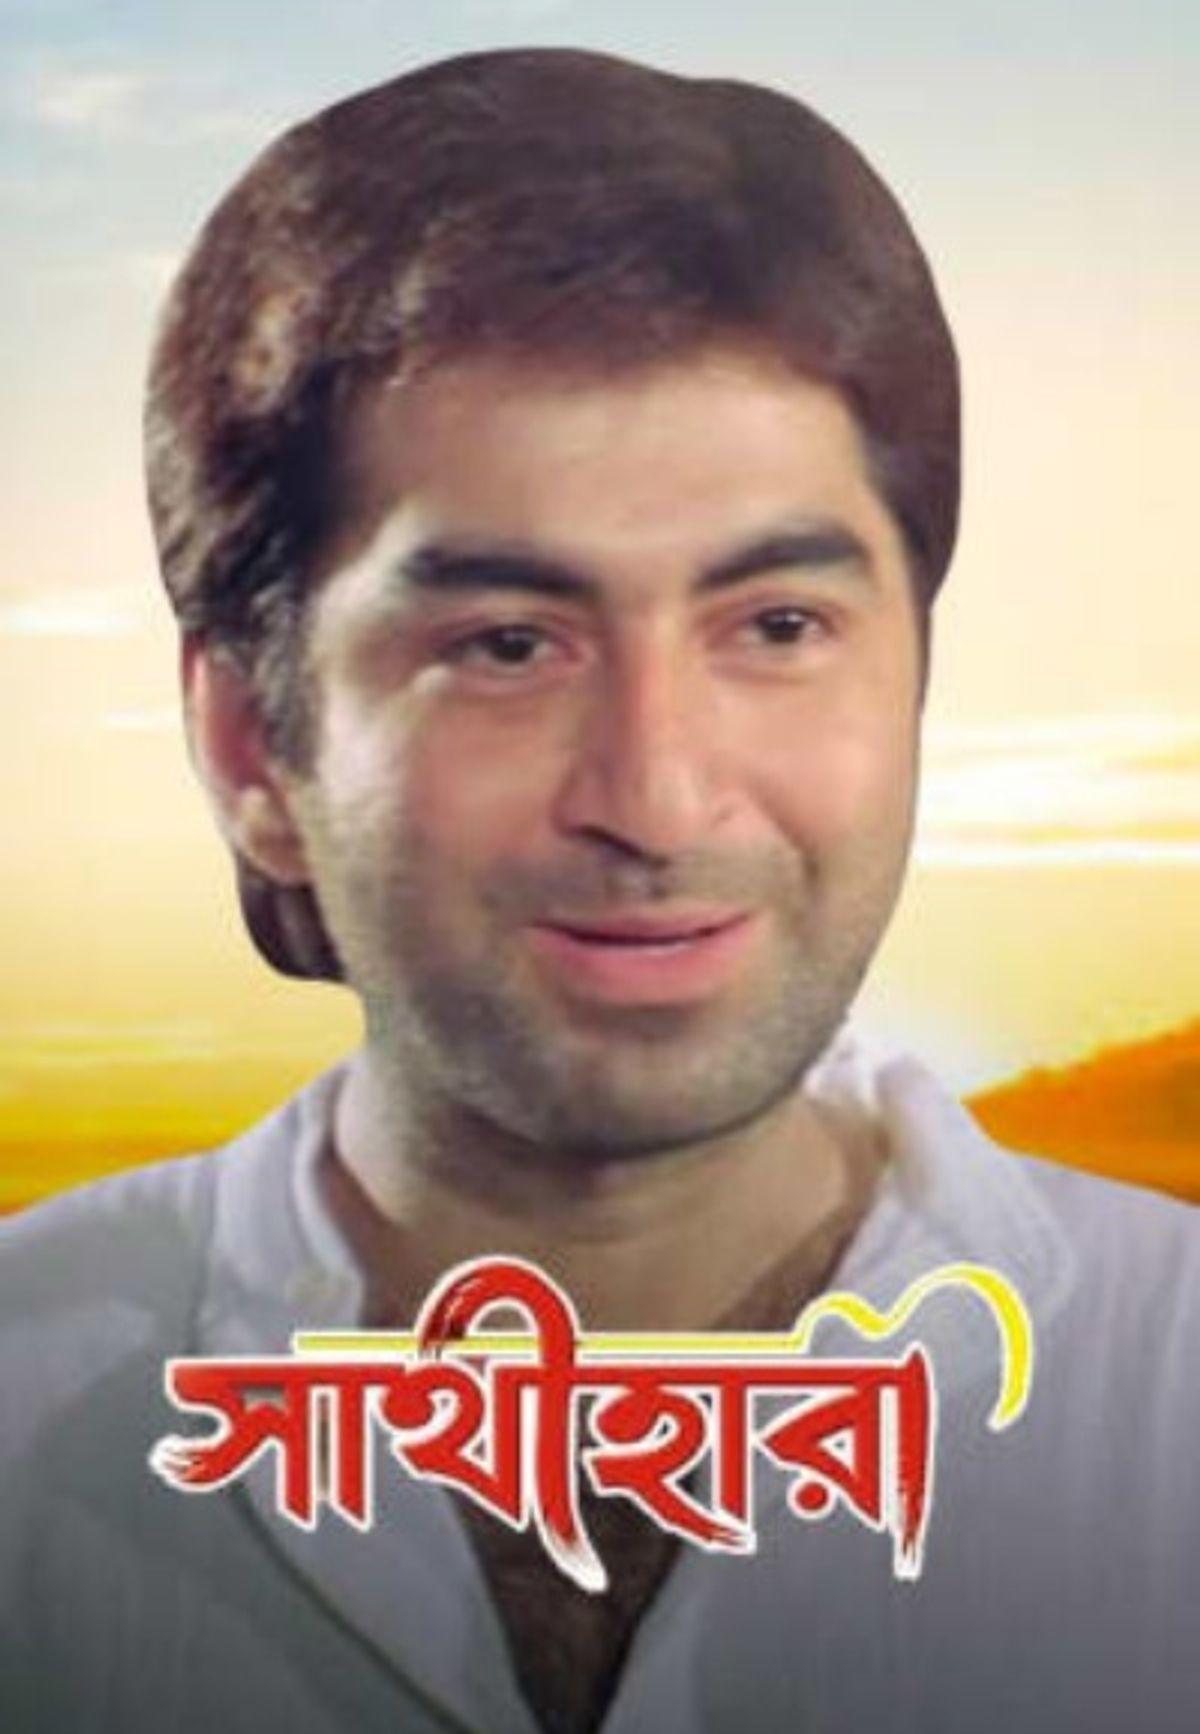 Sathihara